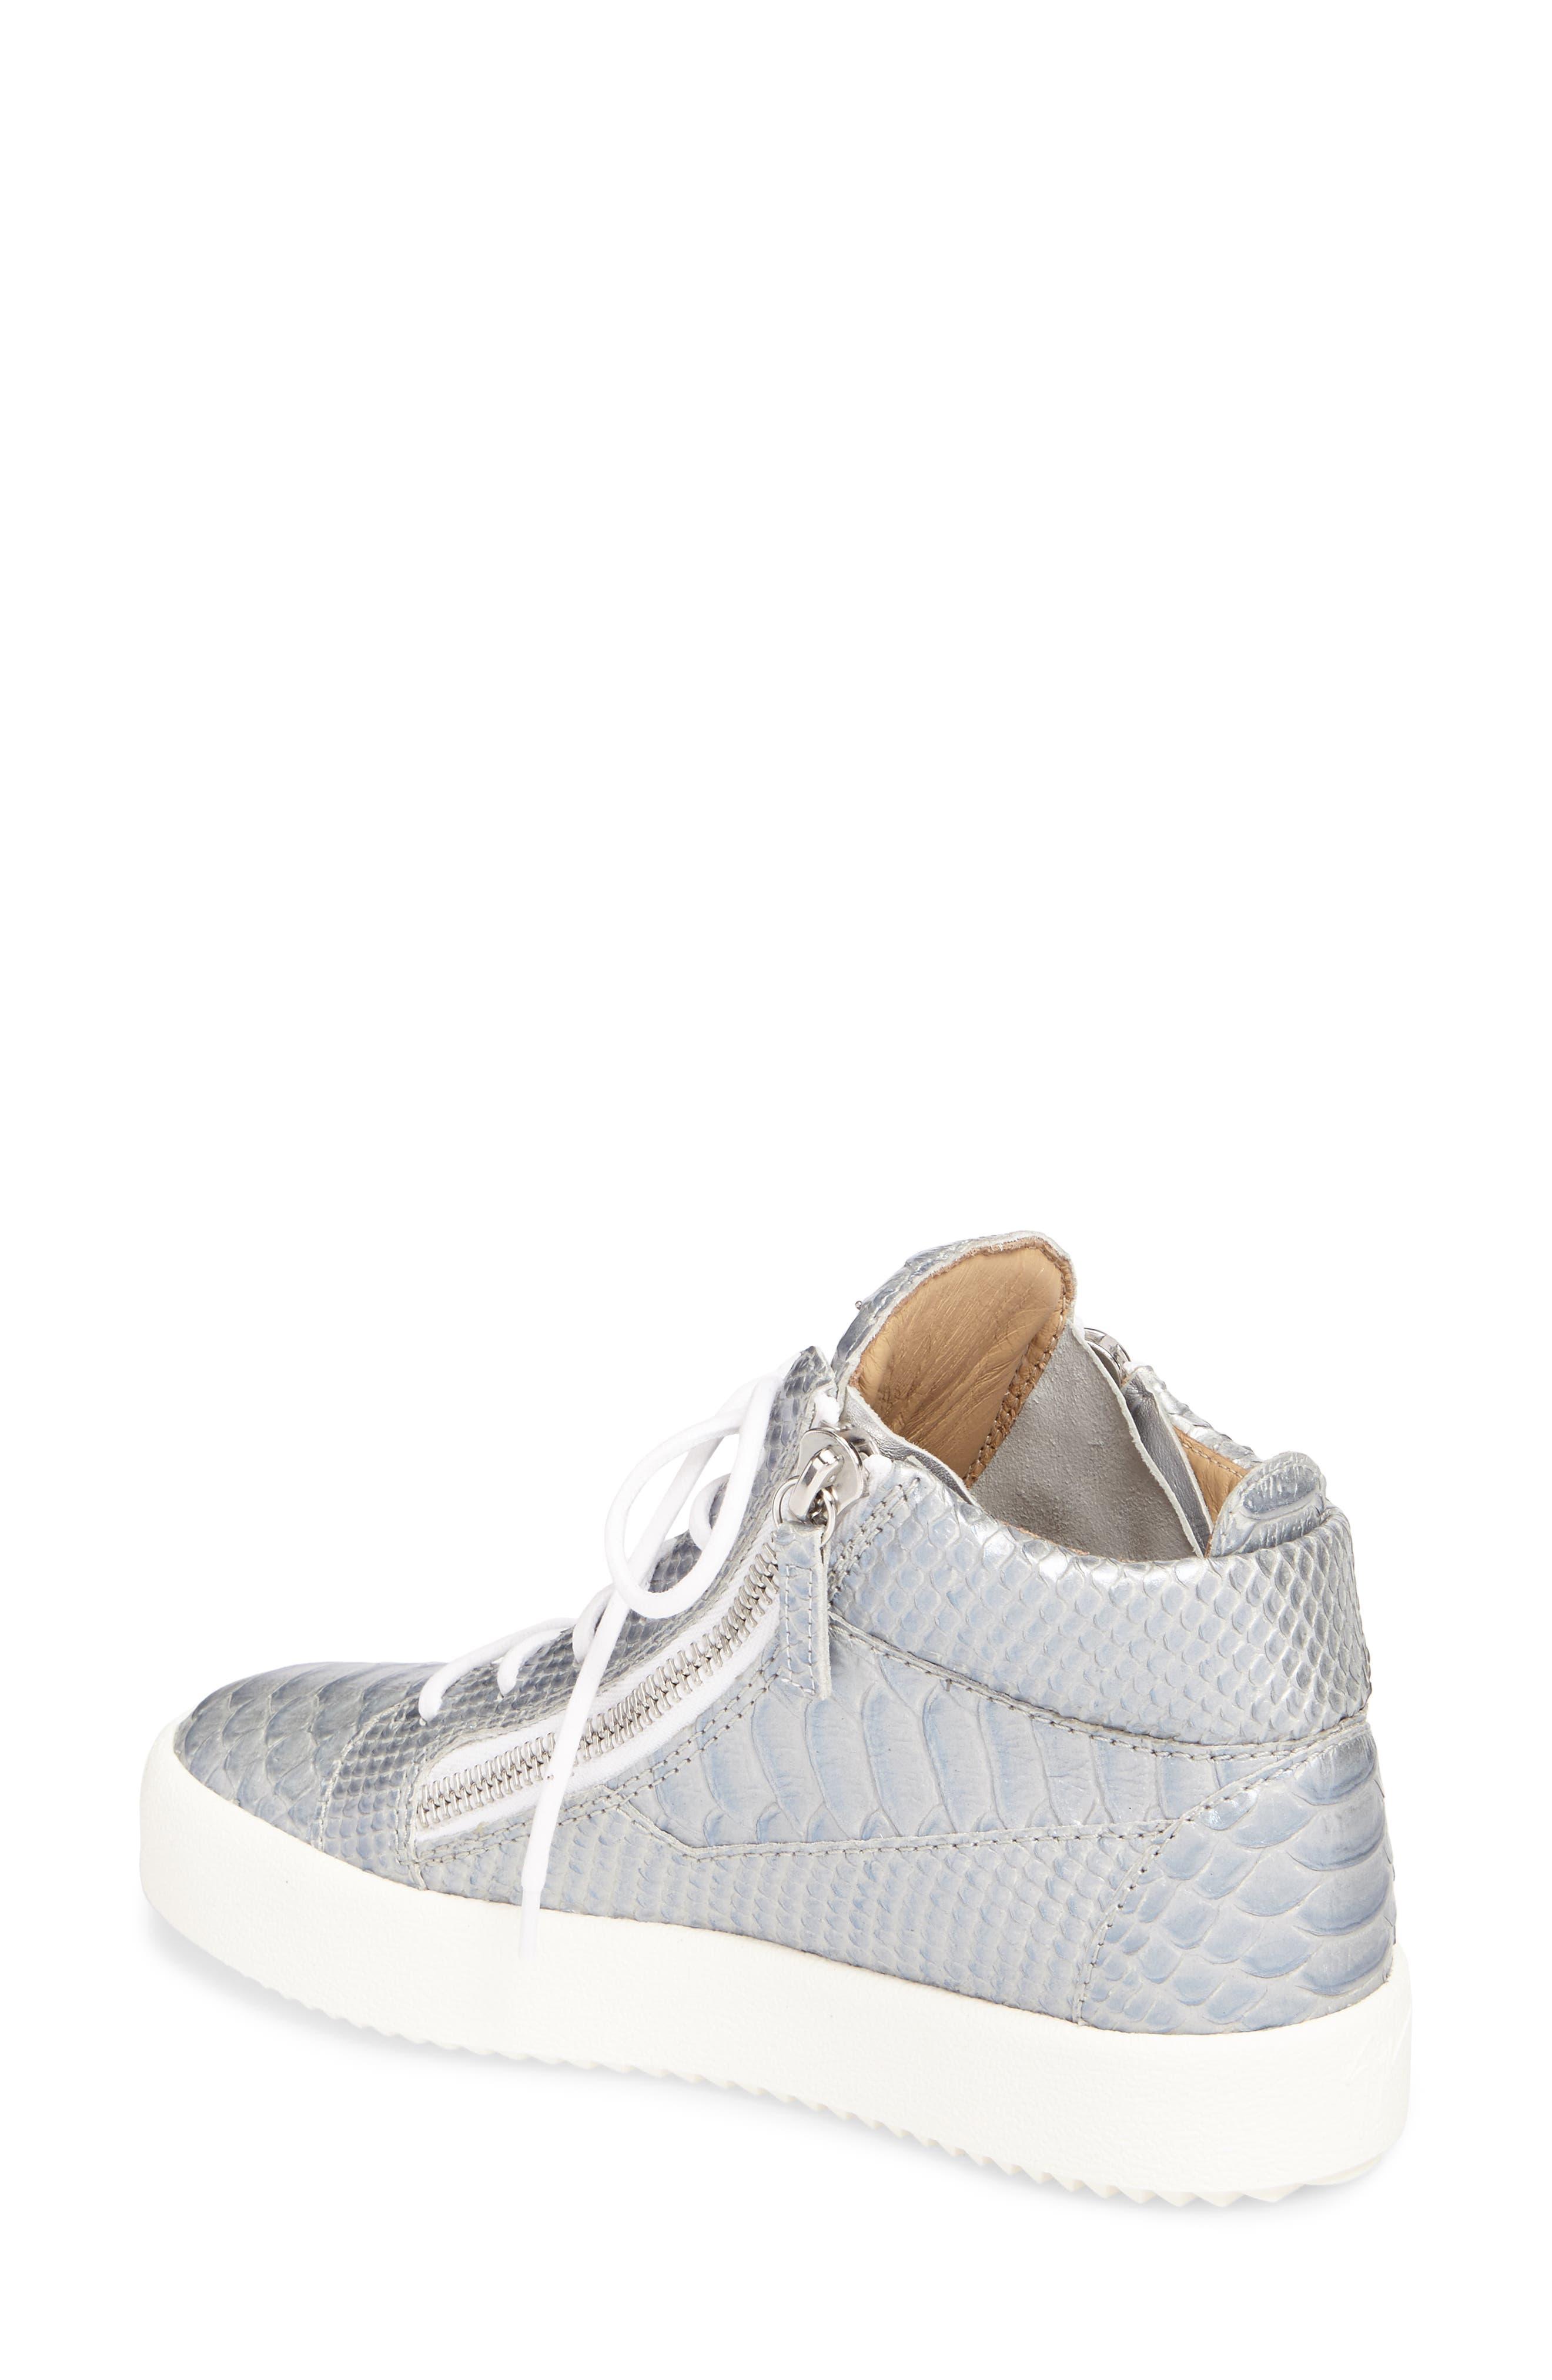 May London Mid Top Sneaker,                             Alternate thumbnail 2, color,                             020